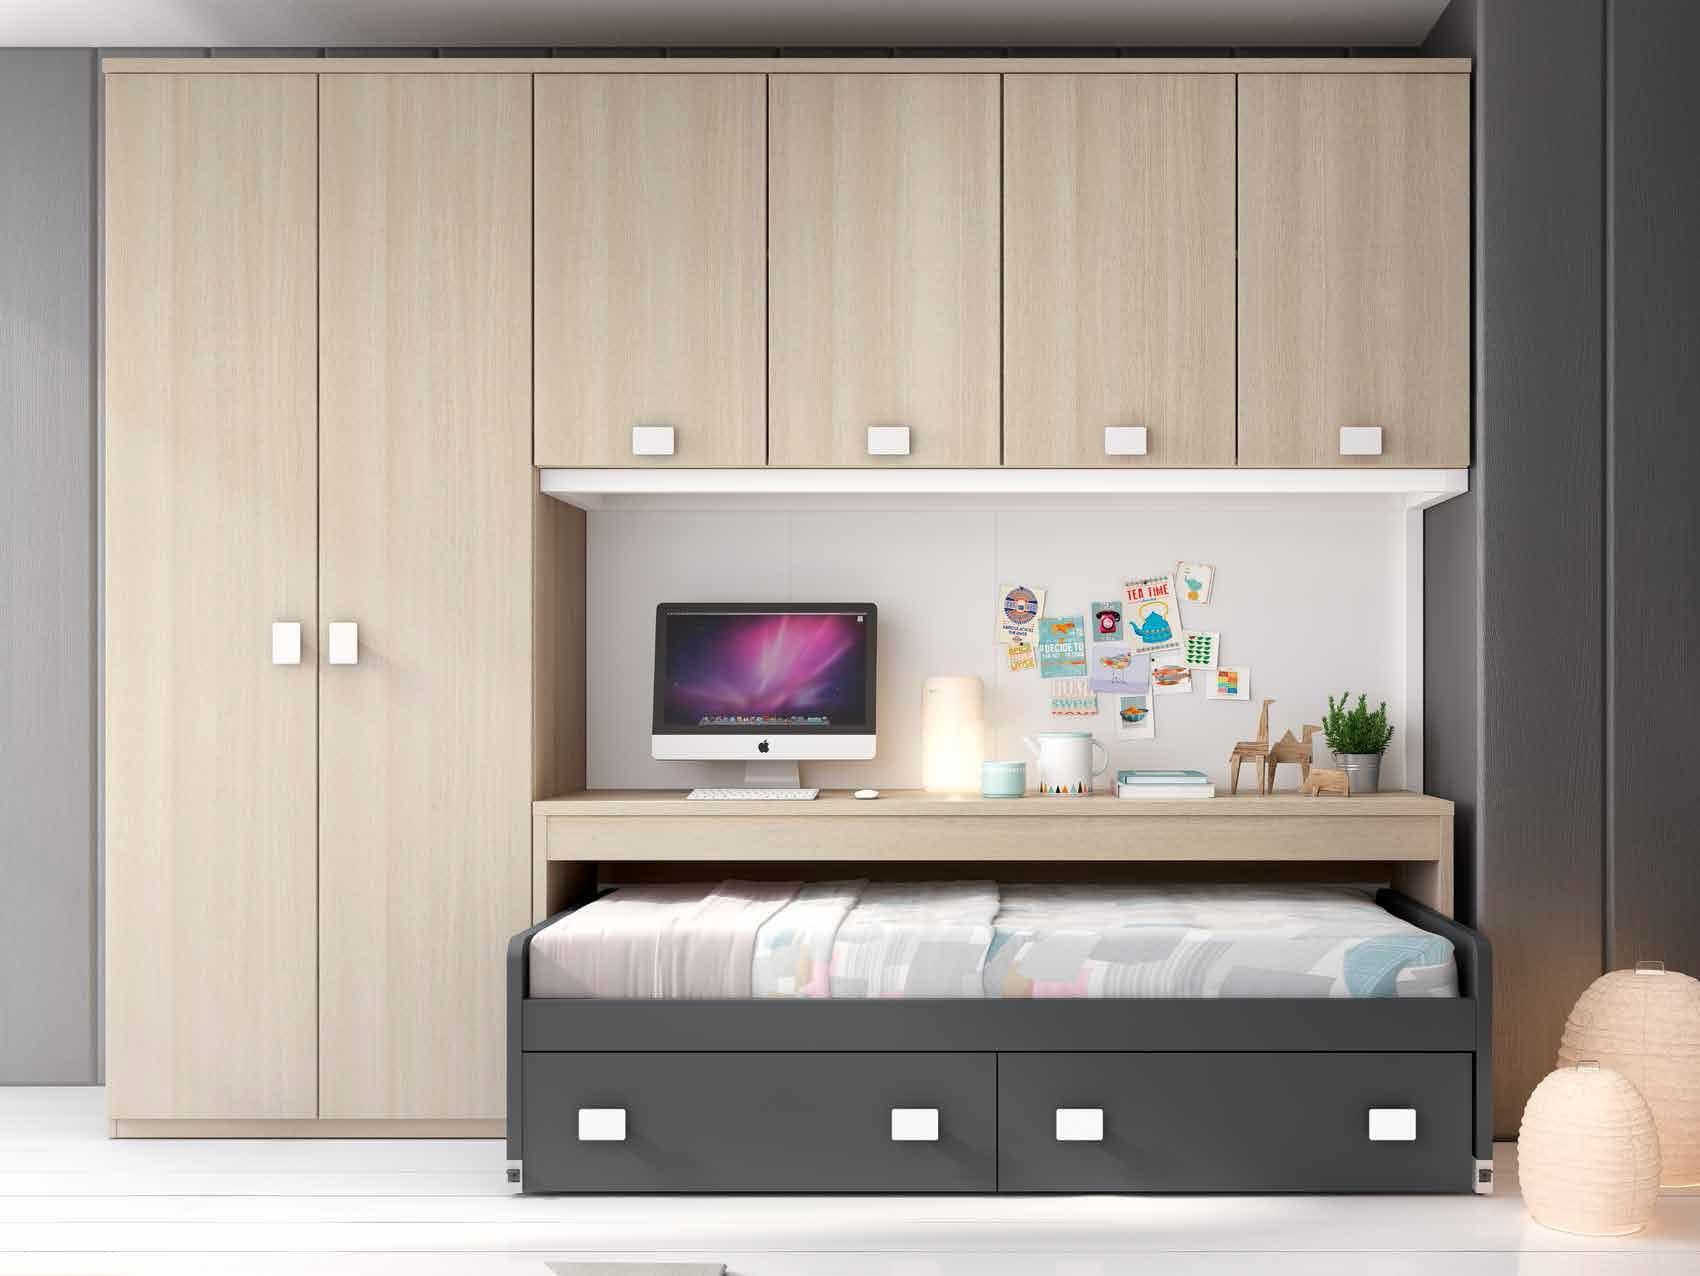 Camas de dormitorio dise os arquitect nicos for Dormitorios juveniles hipopotamo